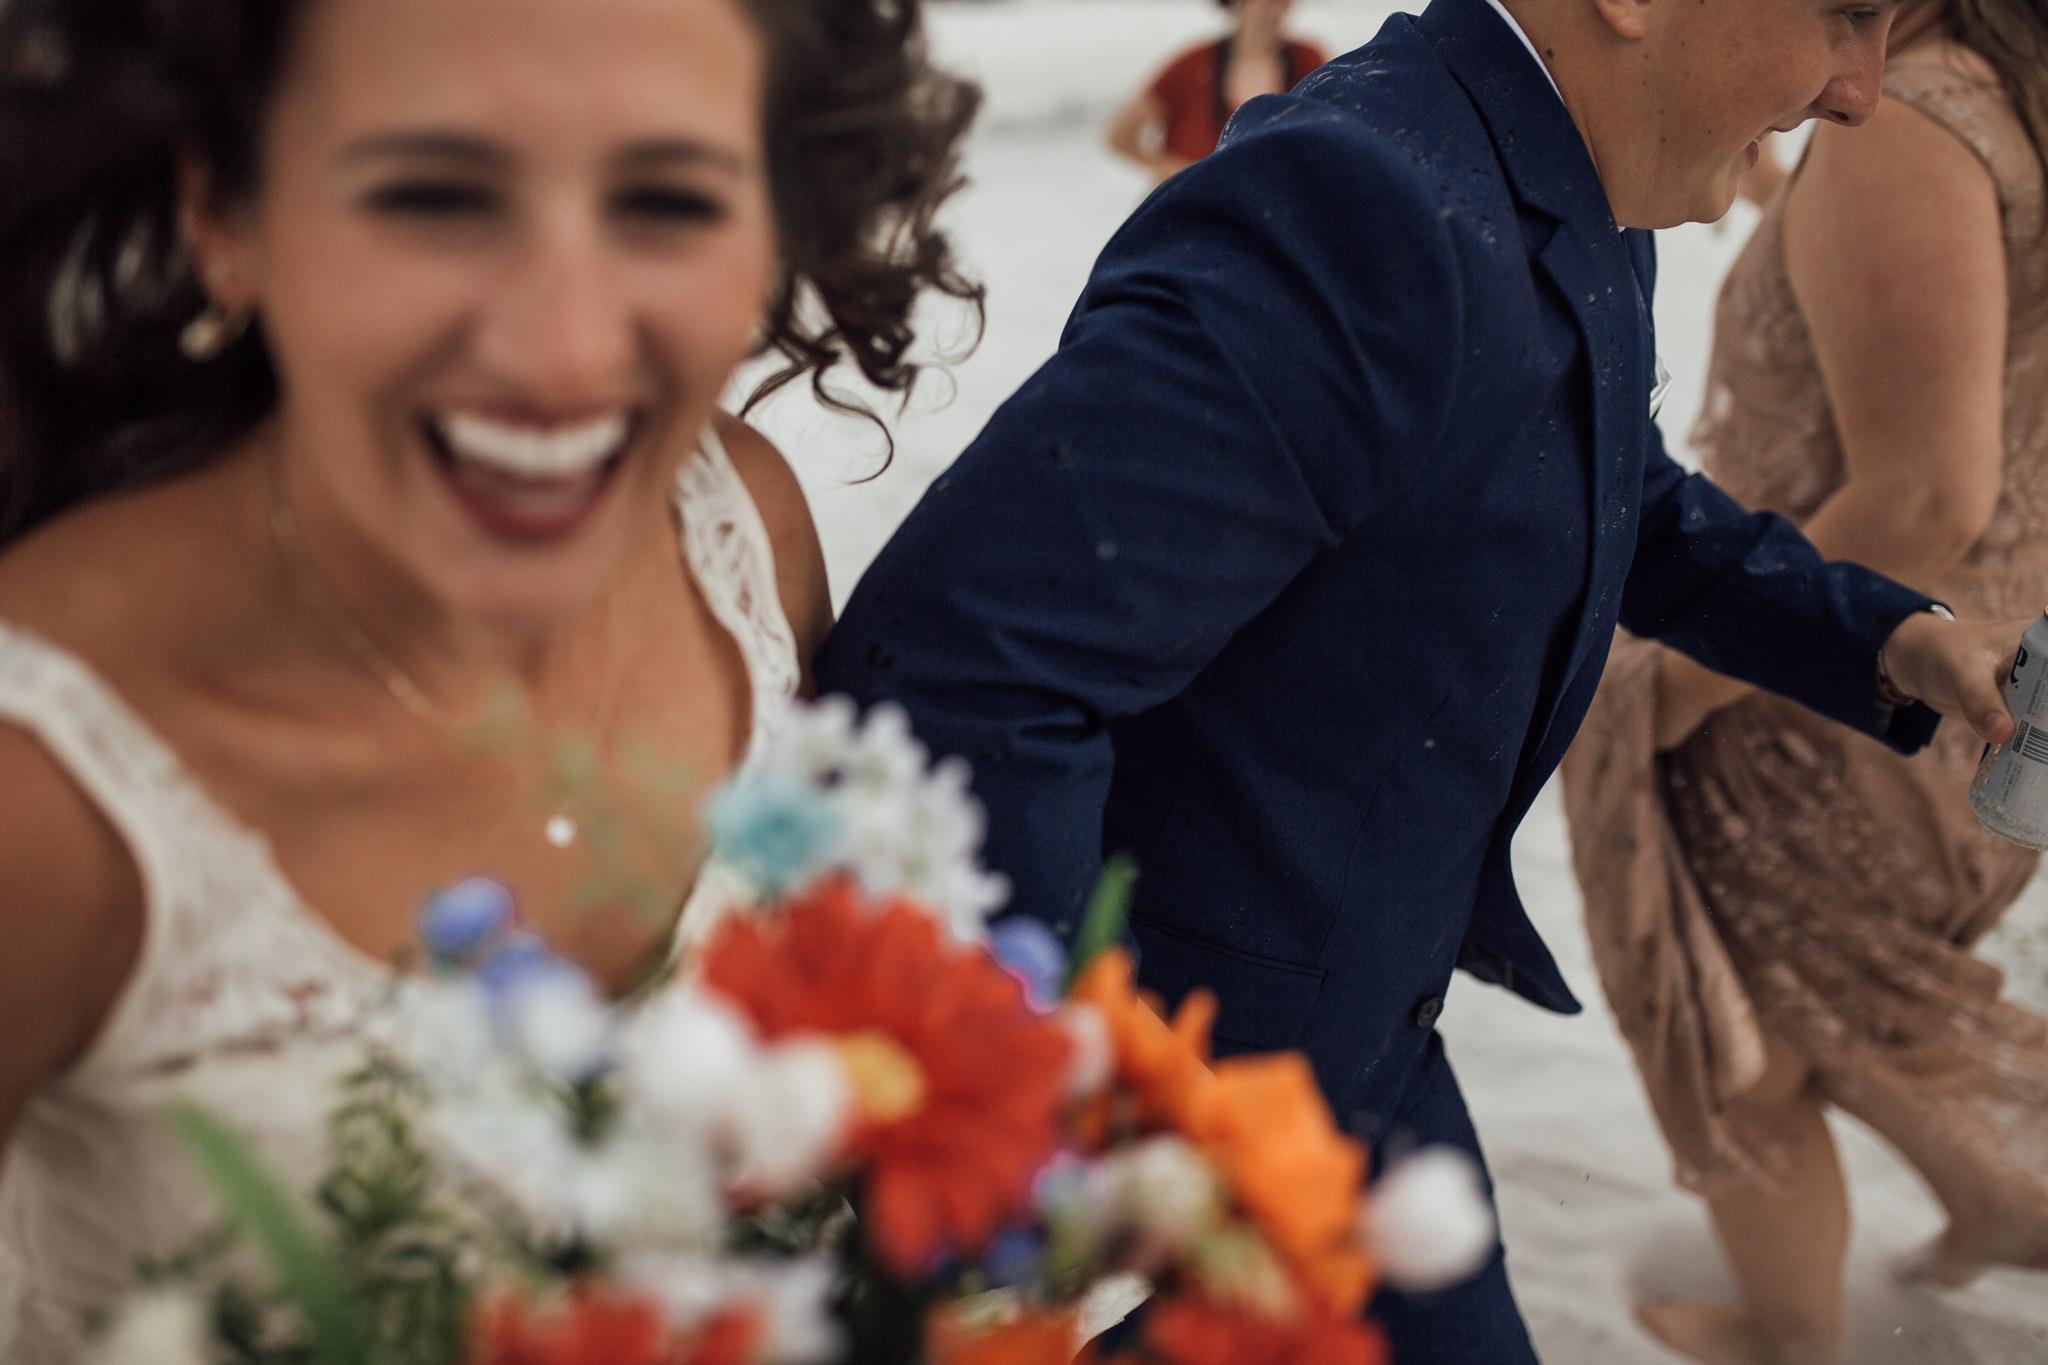 cassie-cook-photography-santa-rosa-beach-fl-wedding-farrar-wedding-beach-wedding-destination-wedding-8-2.jpg